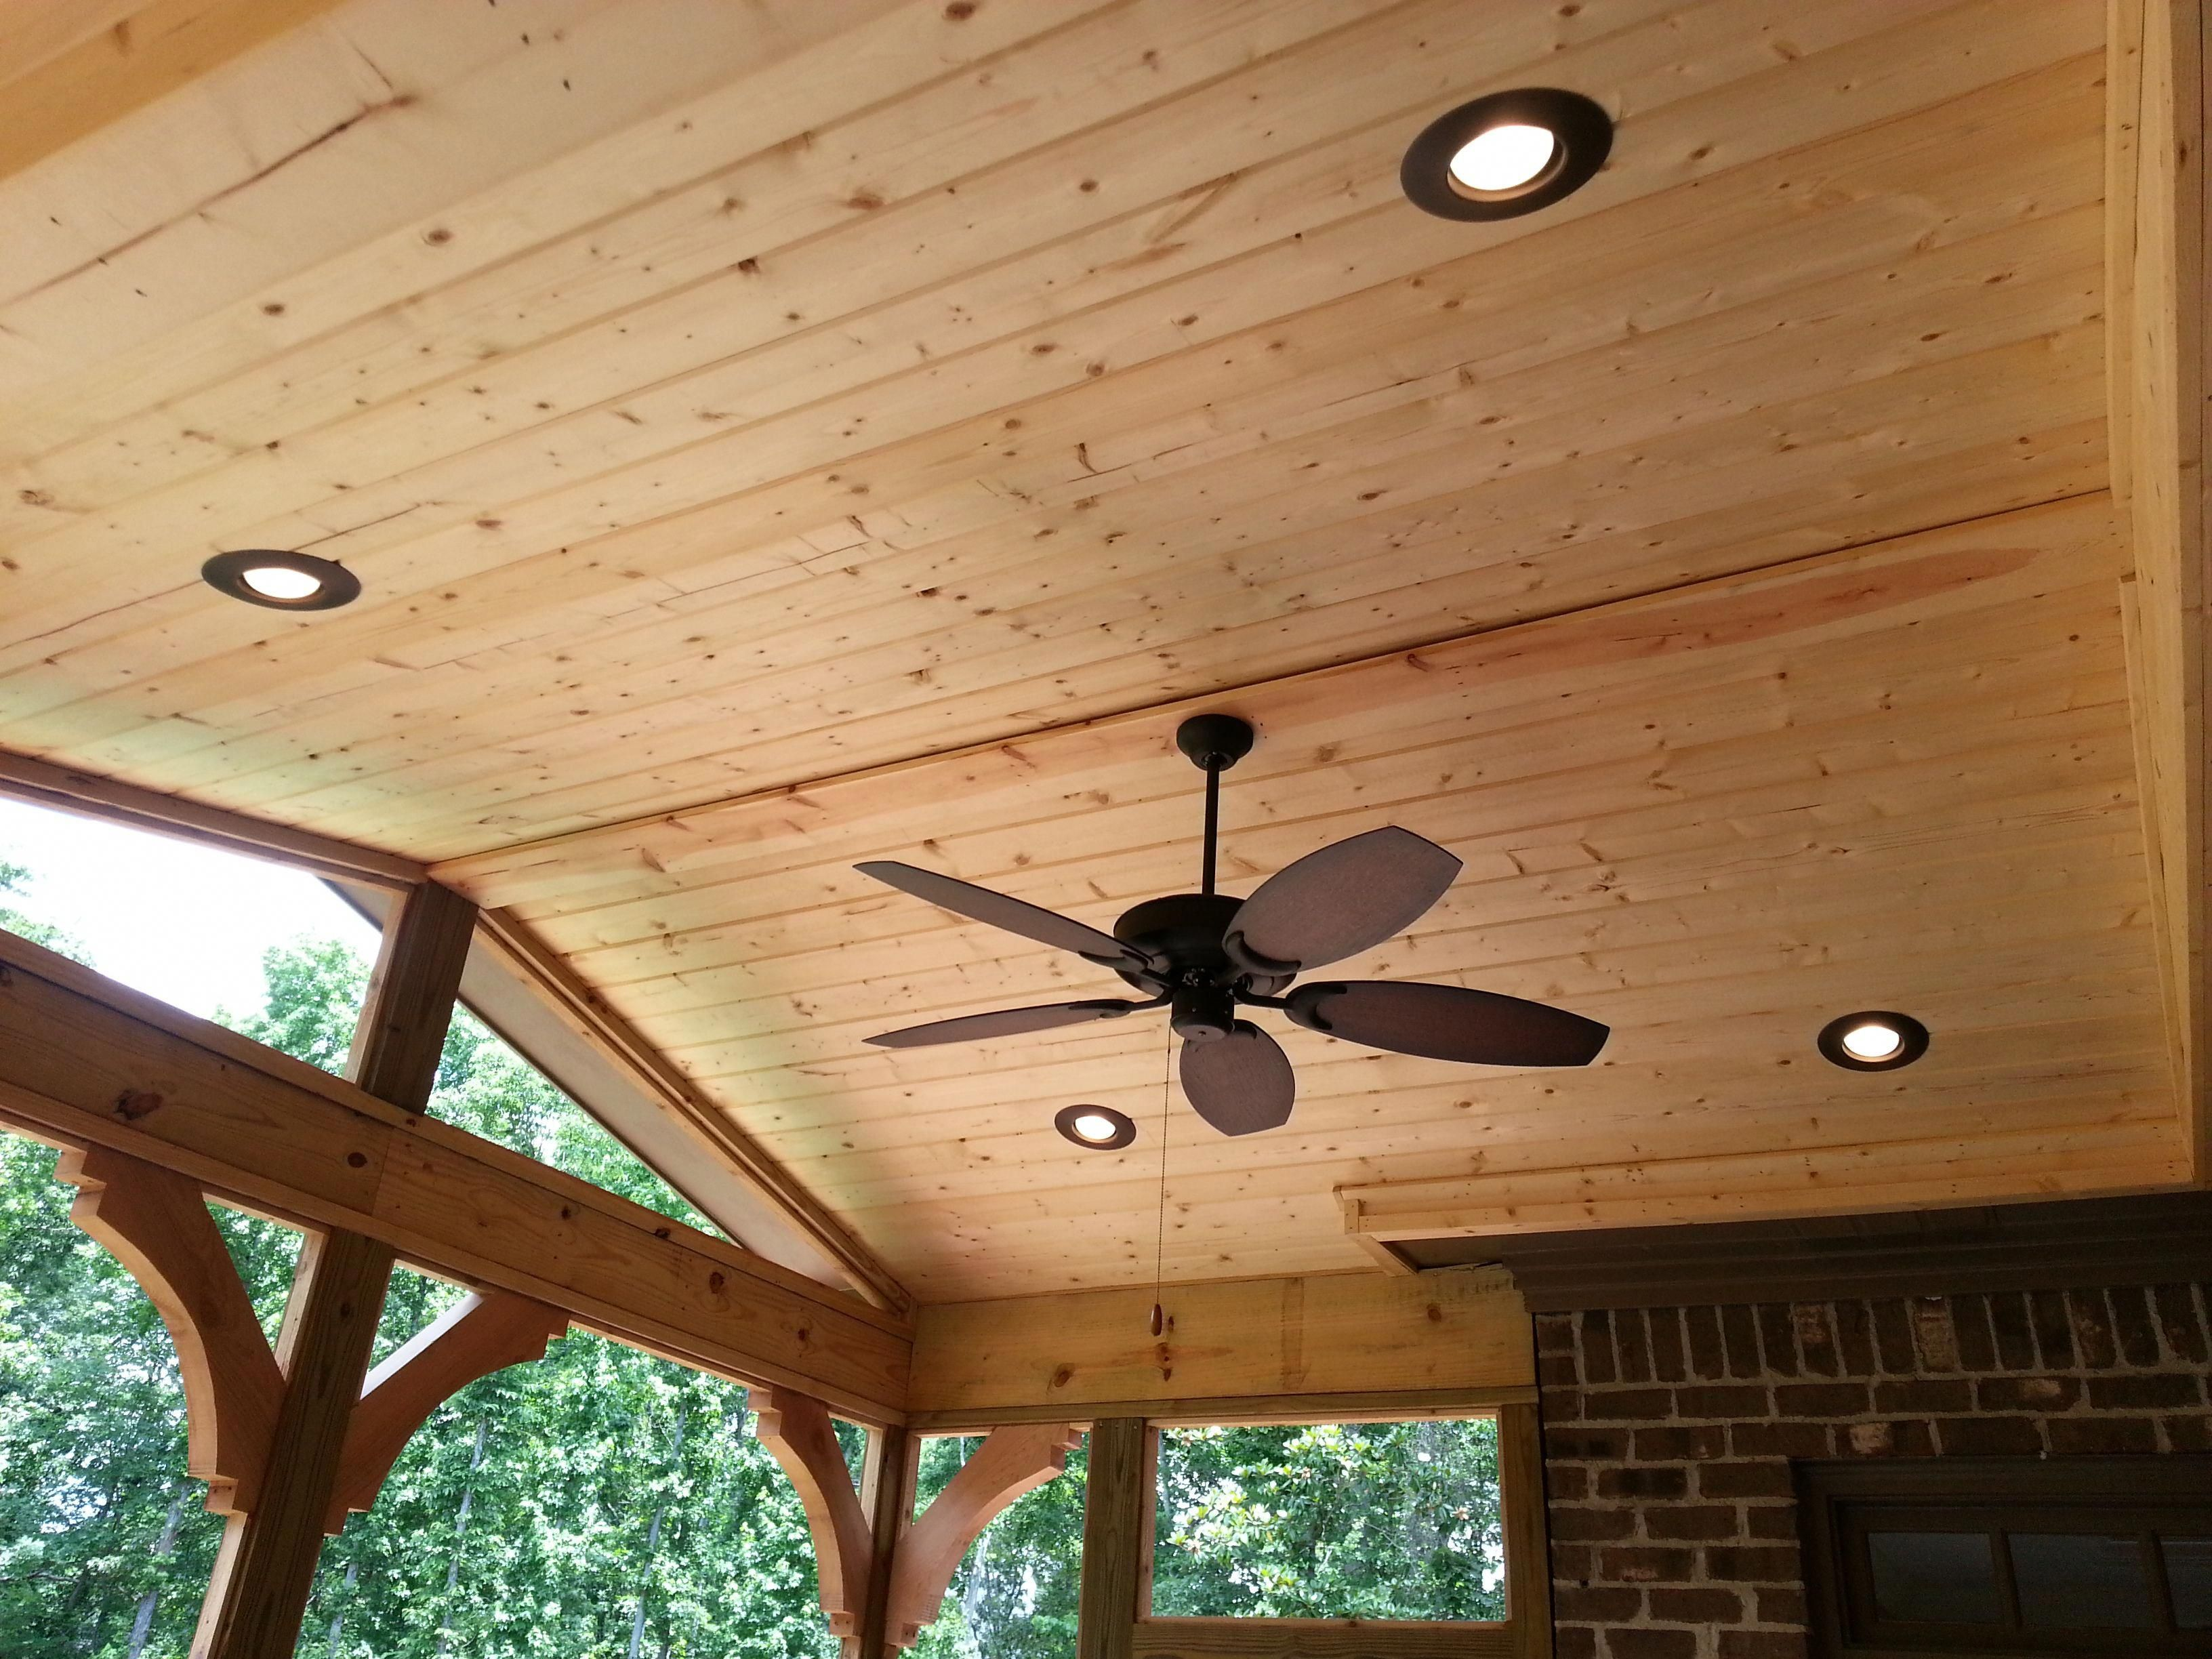 Landscape Outdoor Lighting Ideas For Trees 9916356204 Outdoorlightingpatio Vaulted Ceiling Lighting Porch Lighting Outdoor Ceiling Fans